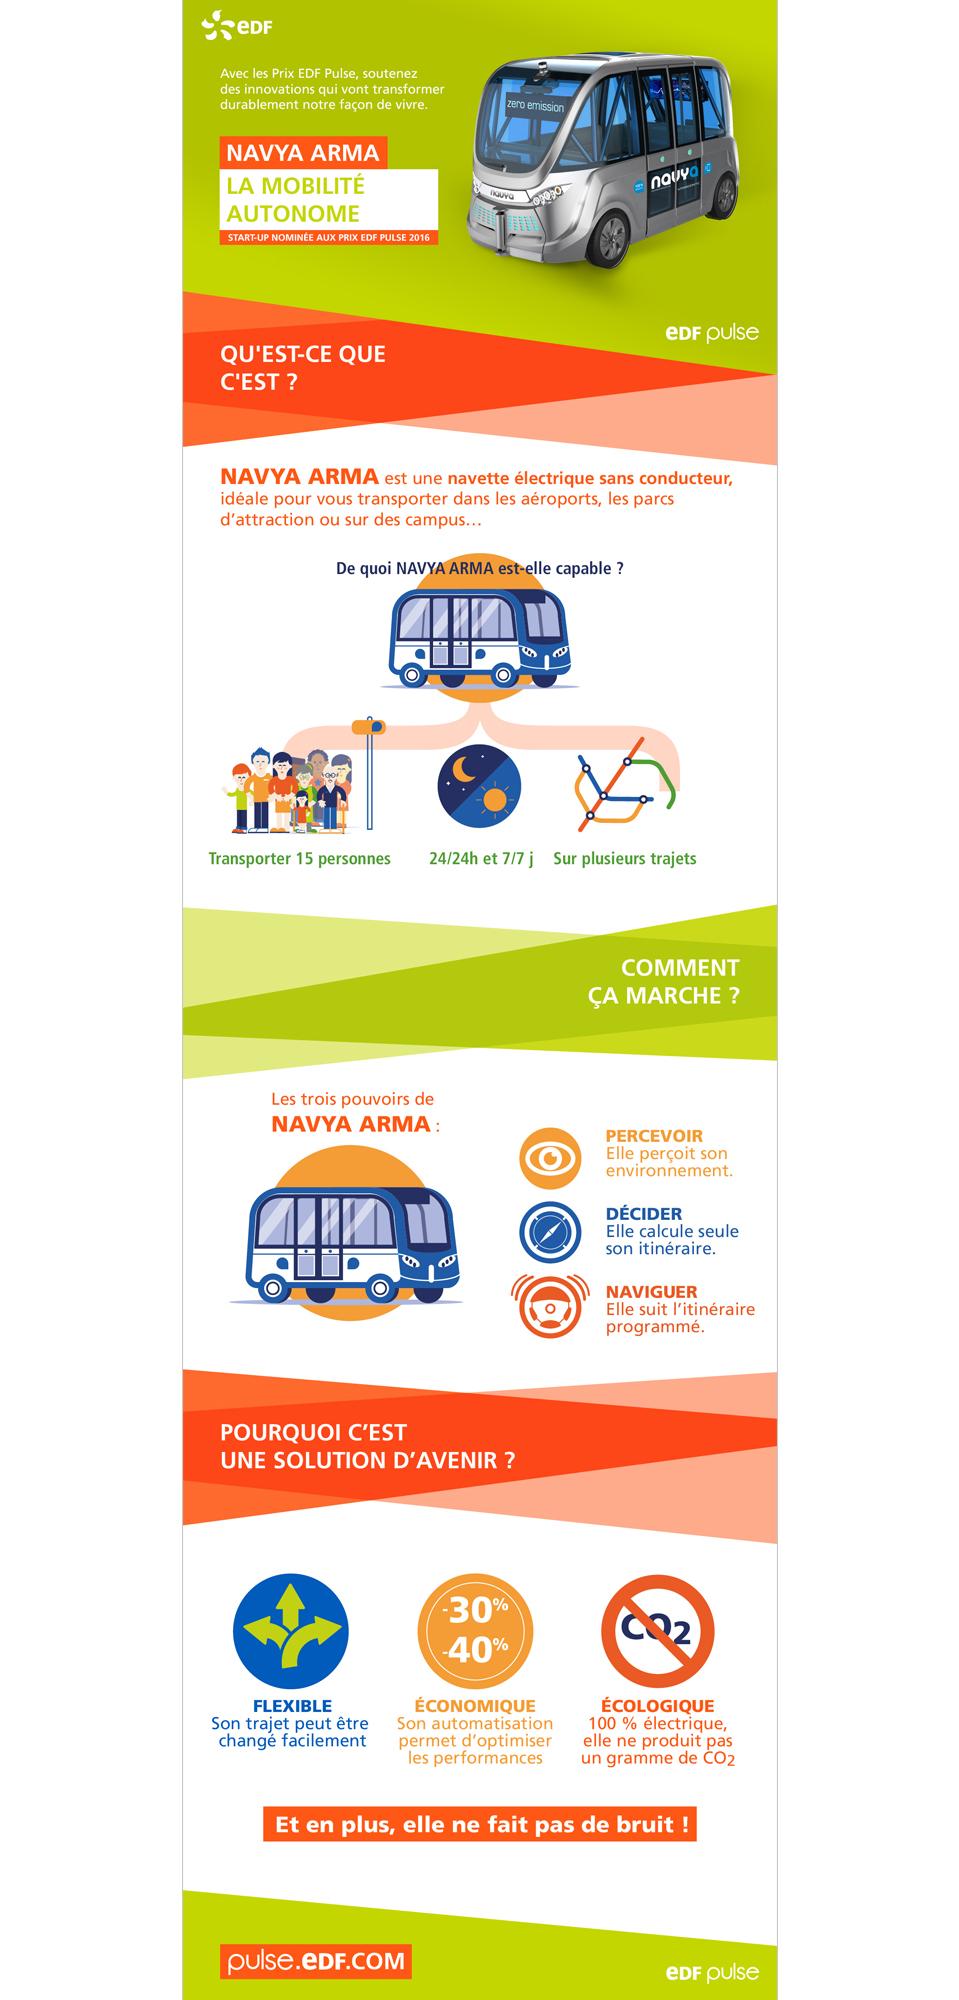 Dataviz - infographie EDF PULSE